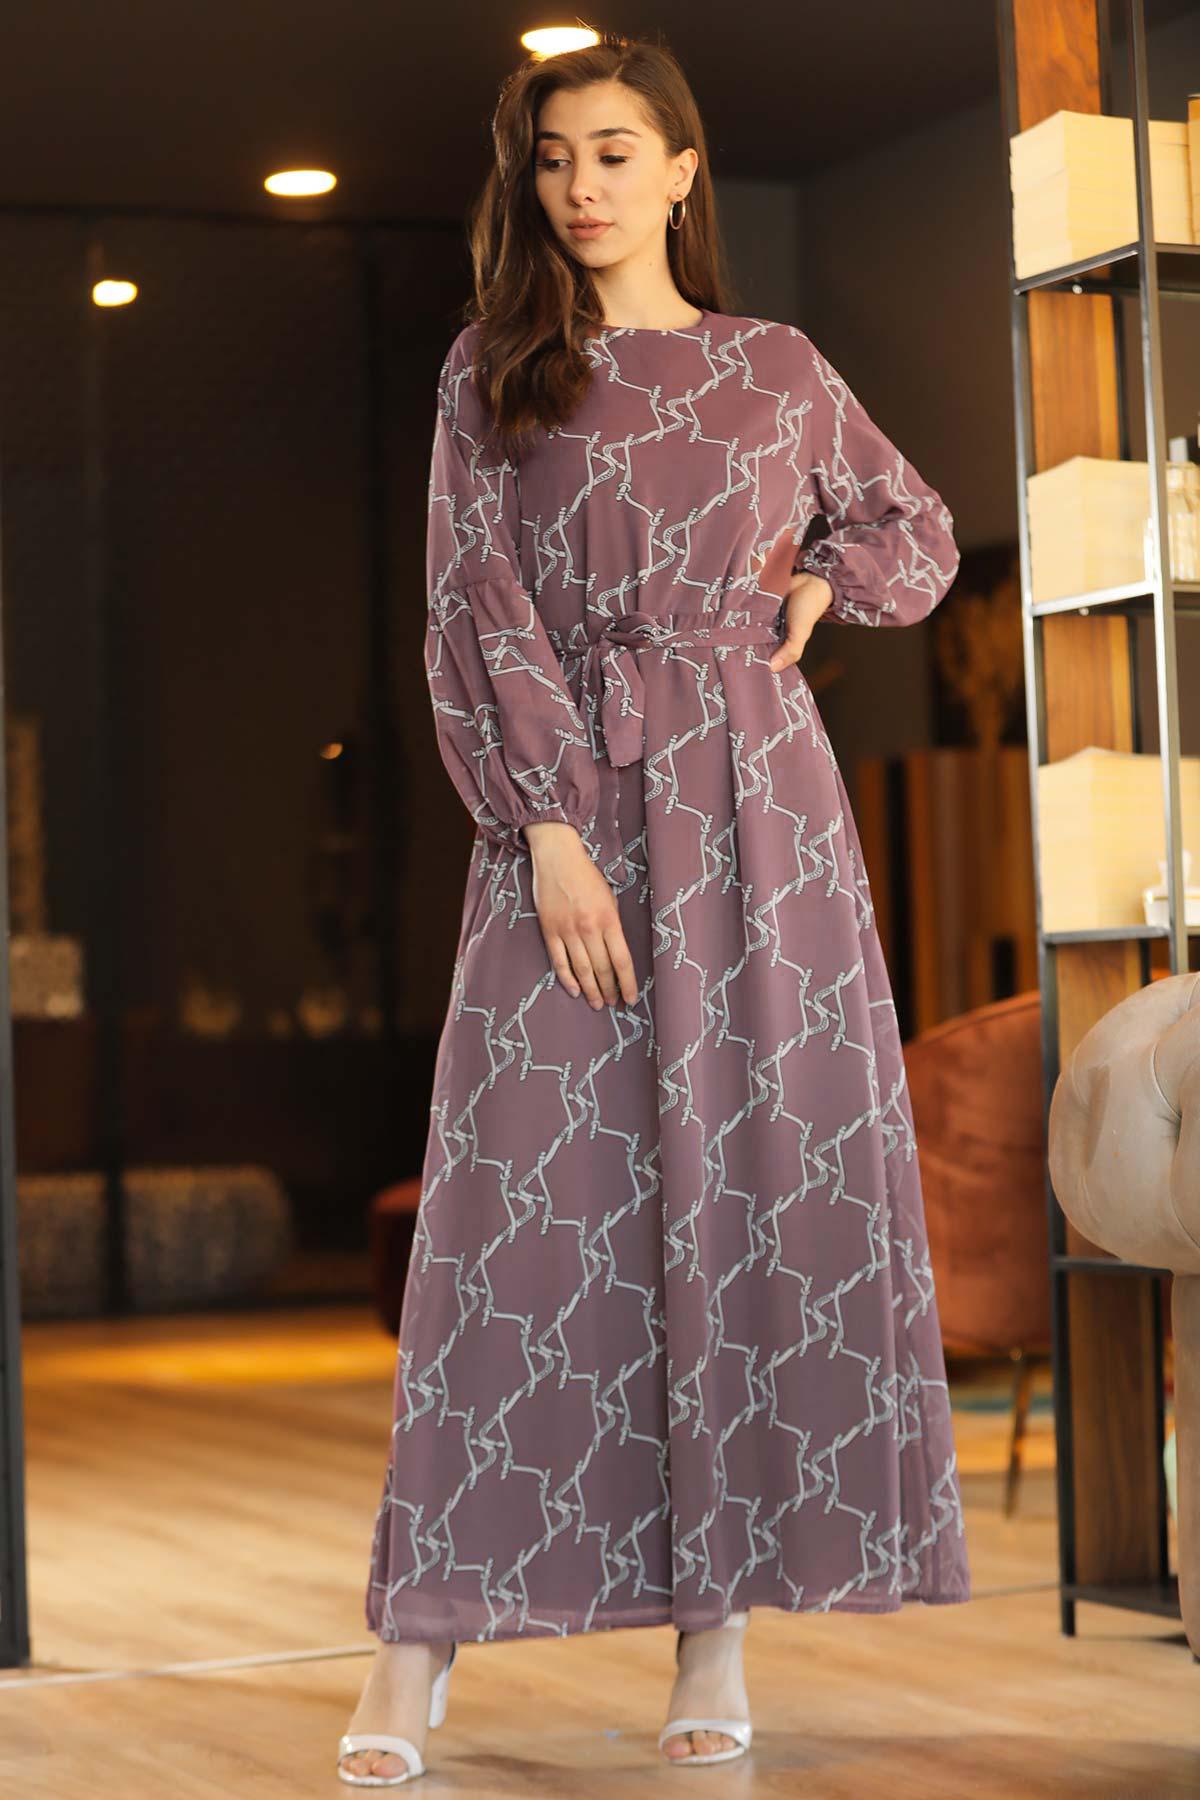 Women's Patterned Dusty Rose Chiffon Long Dress